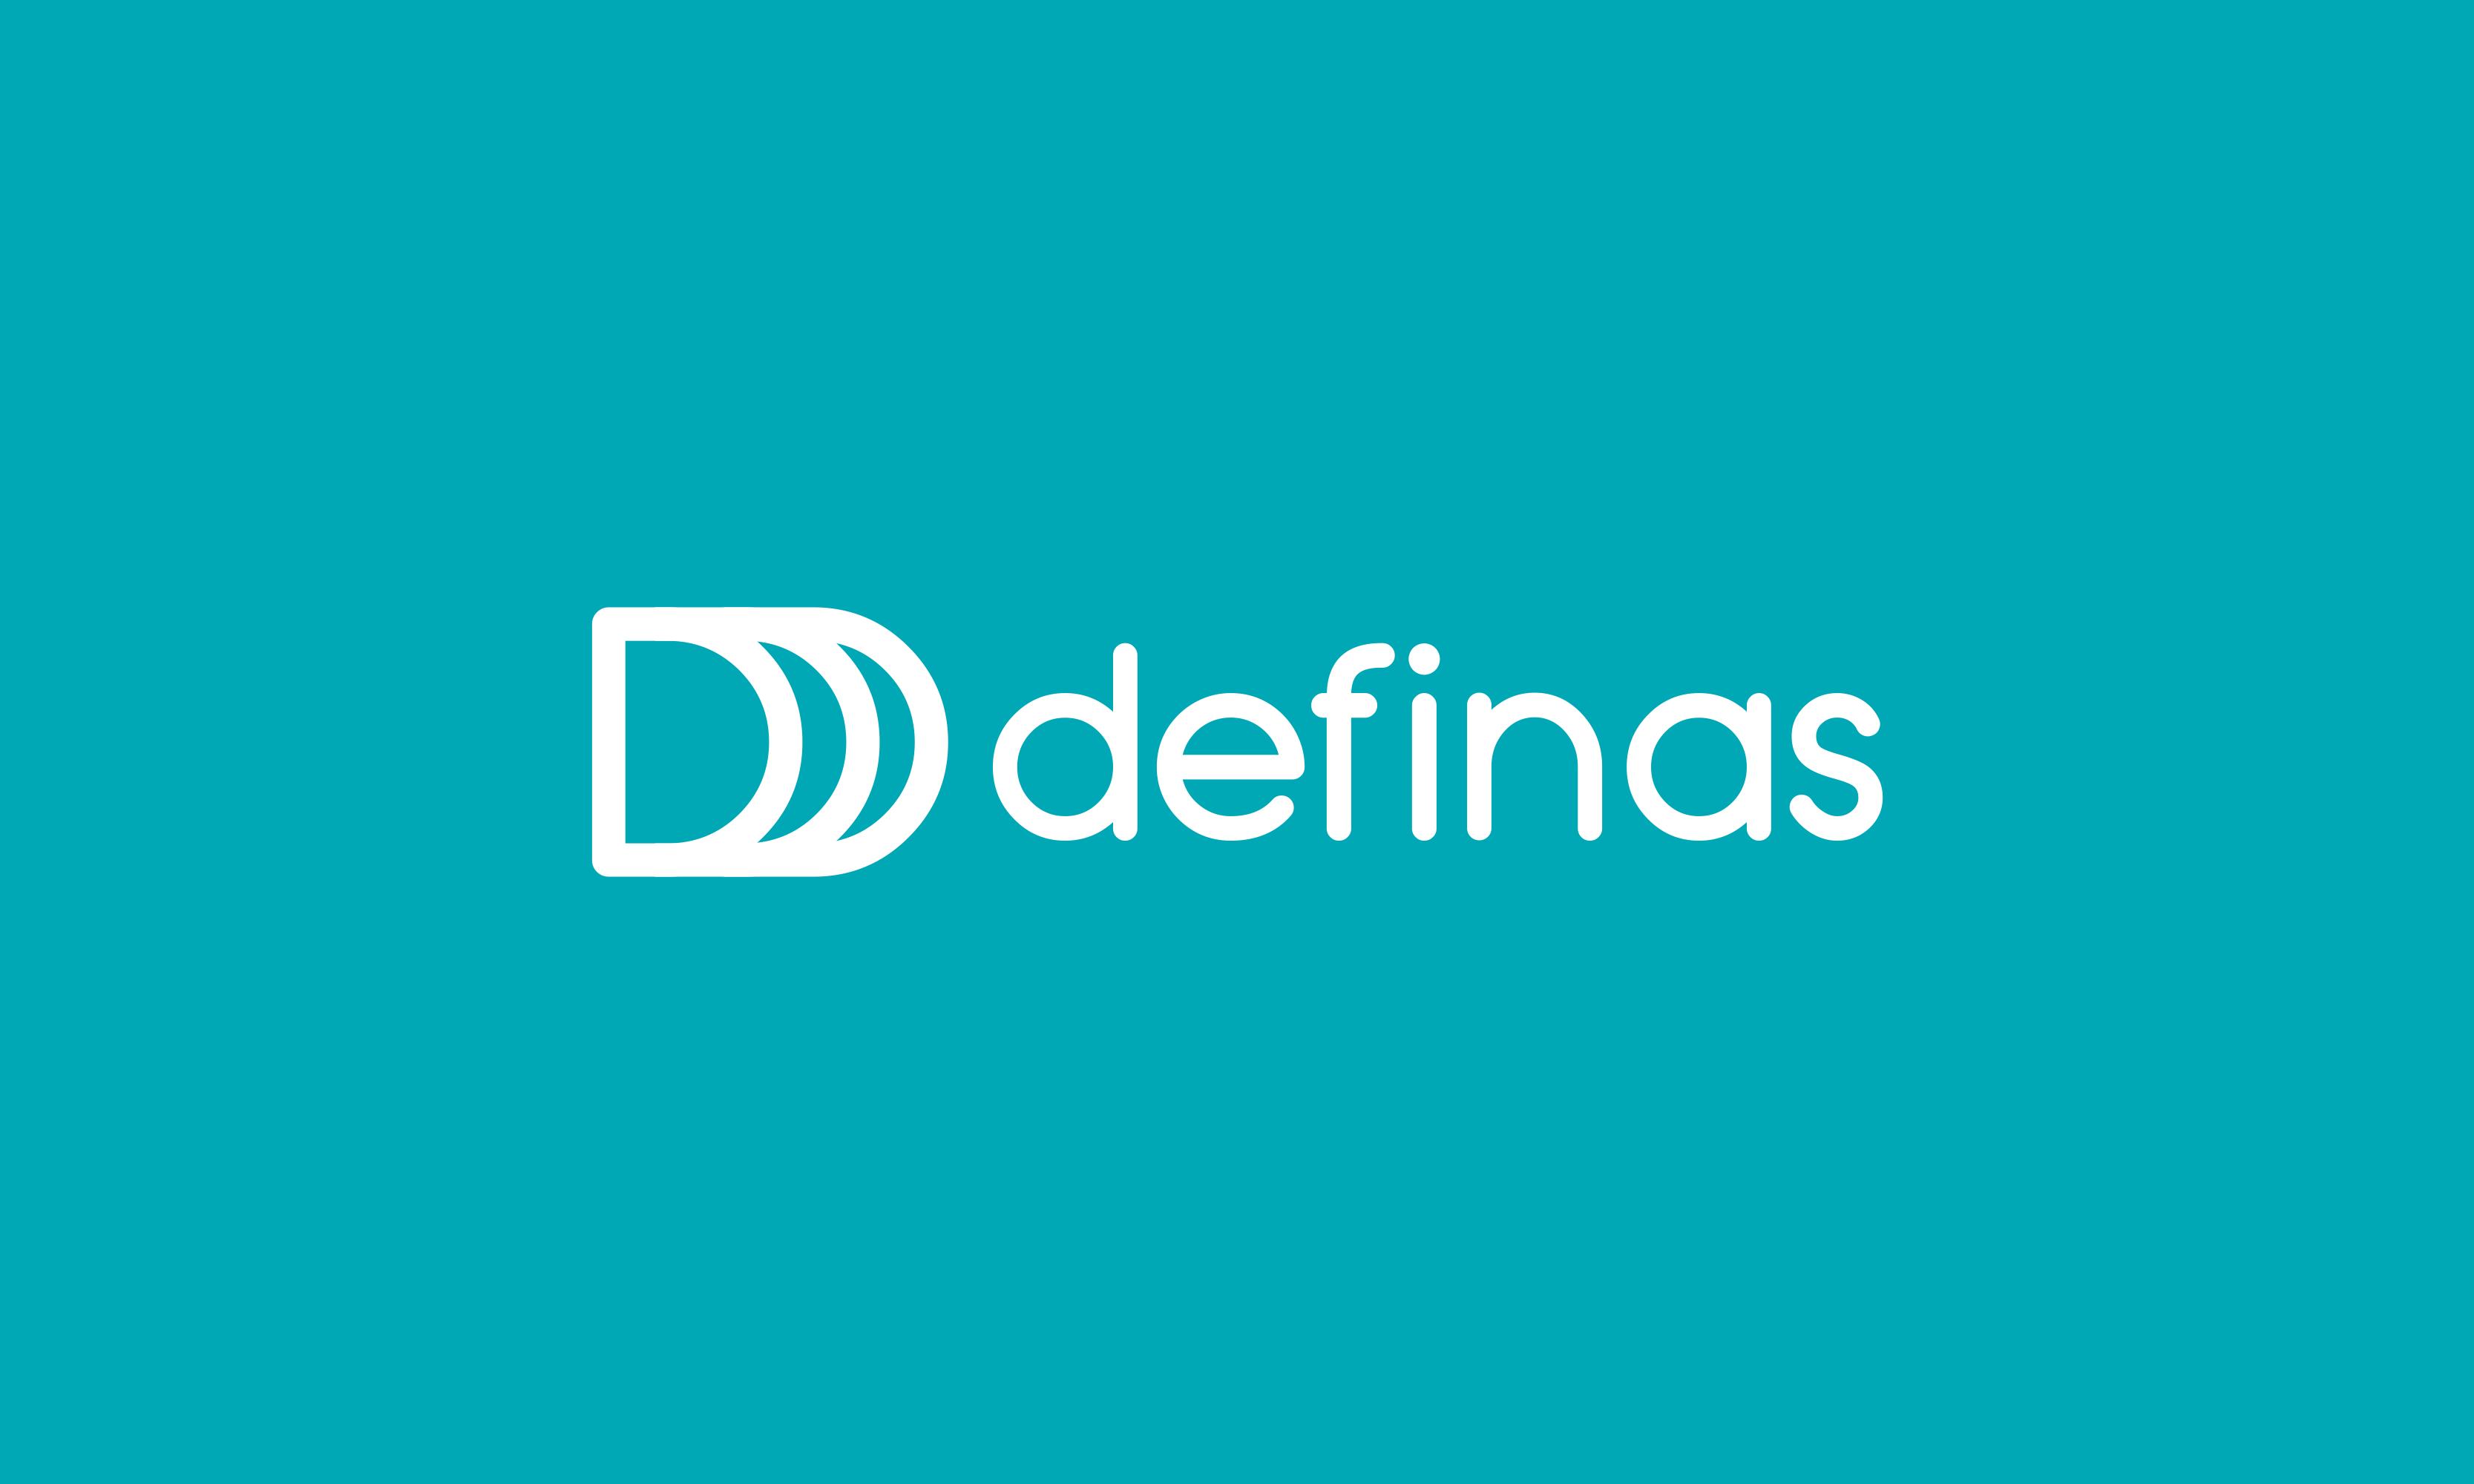 Definas logo